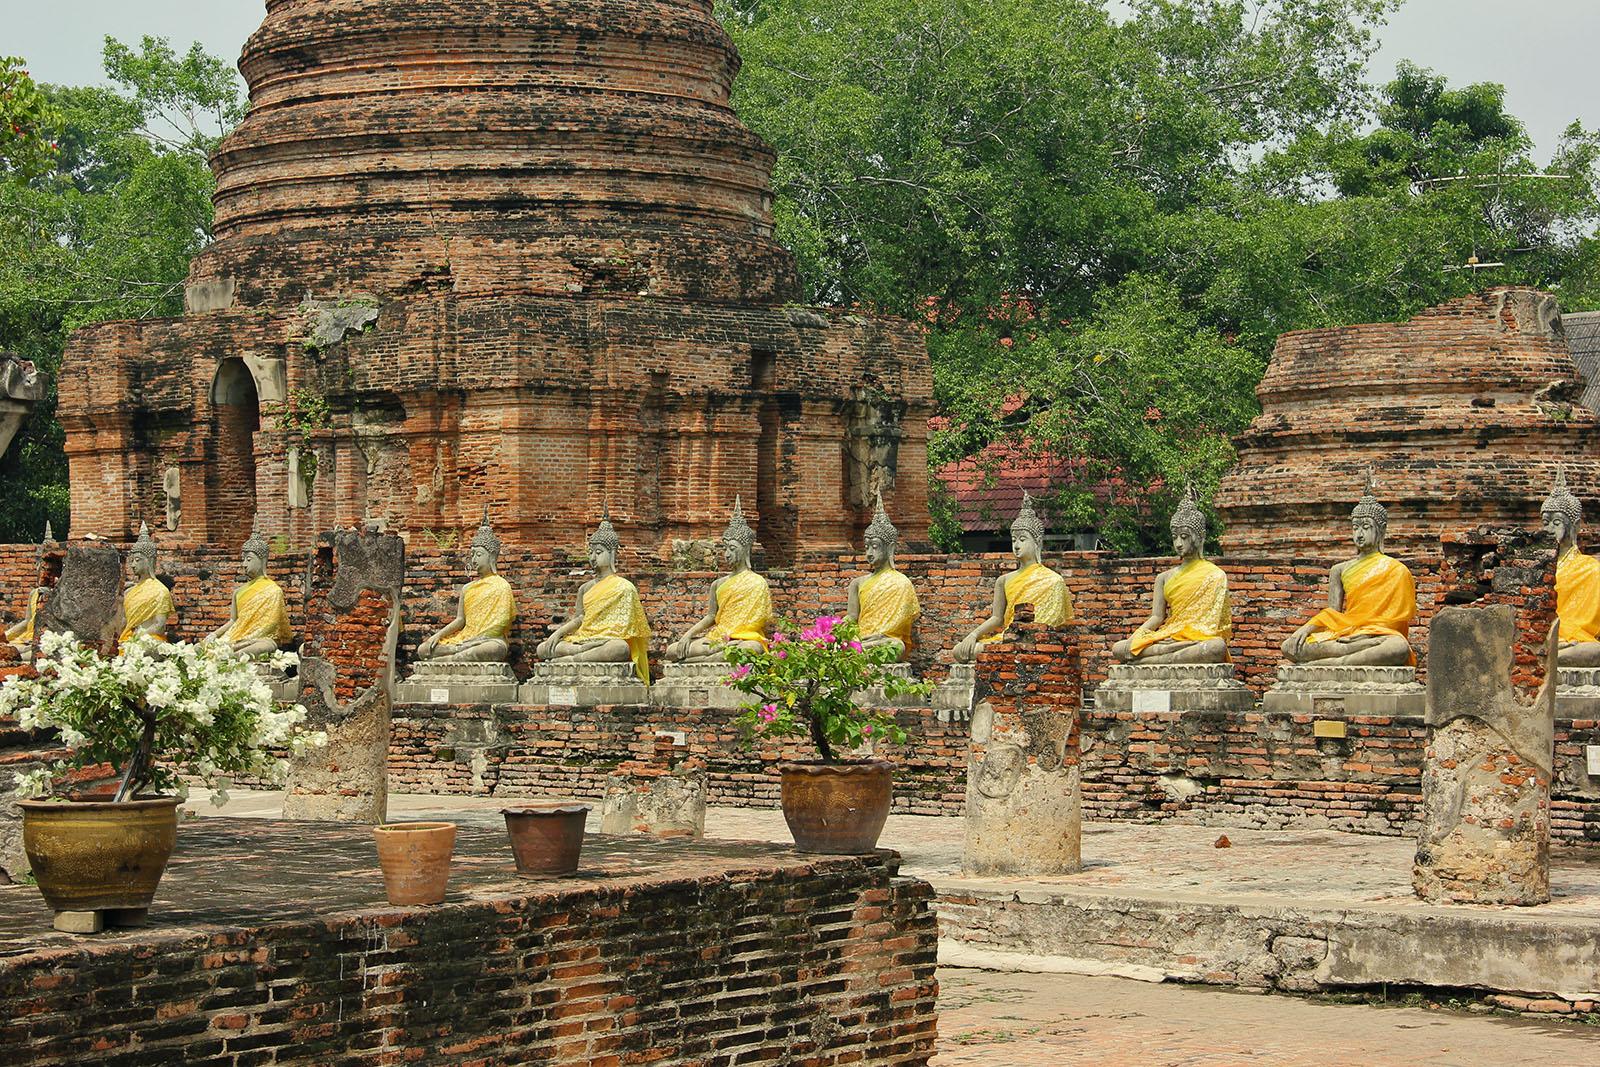 Ayutthaya Historical Park - Ayutthaya - Thailand